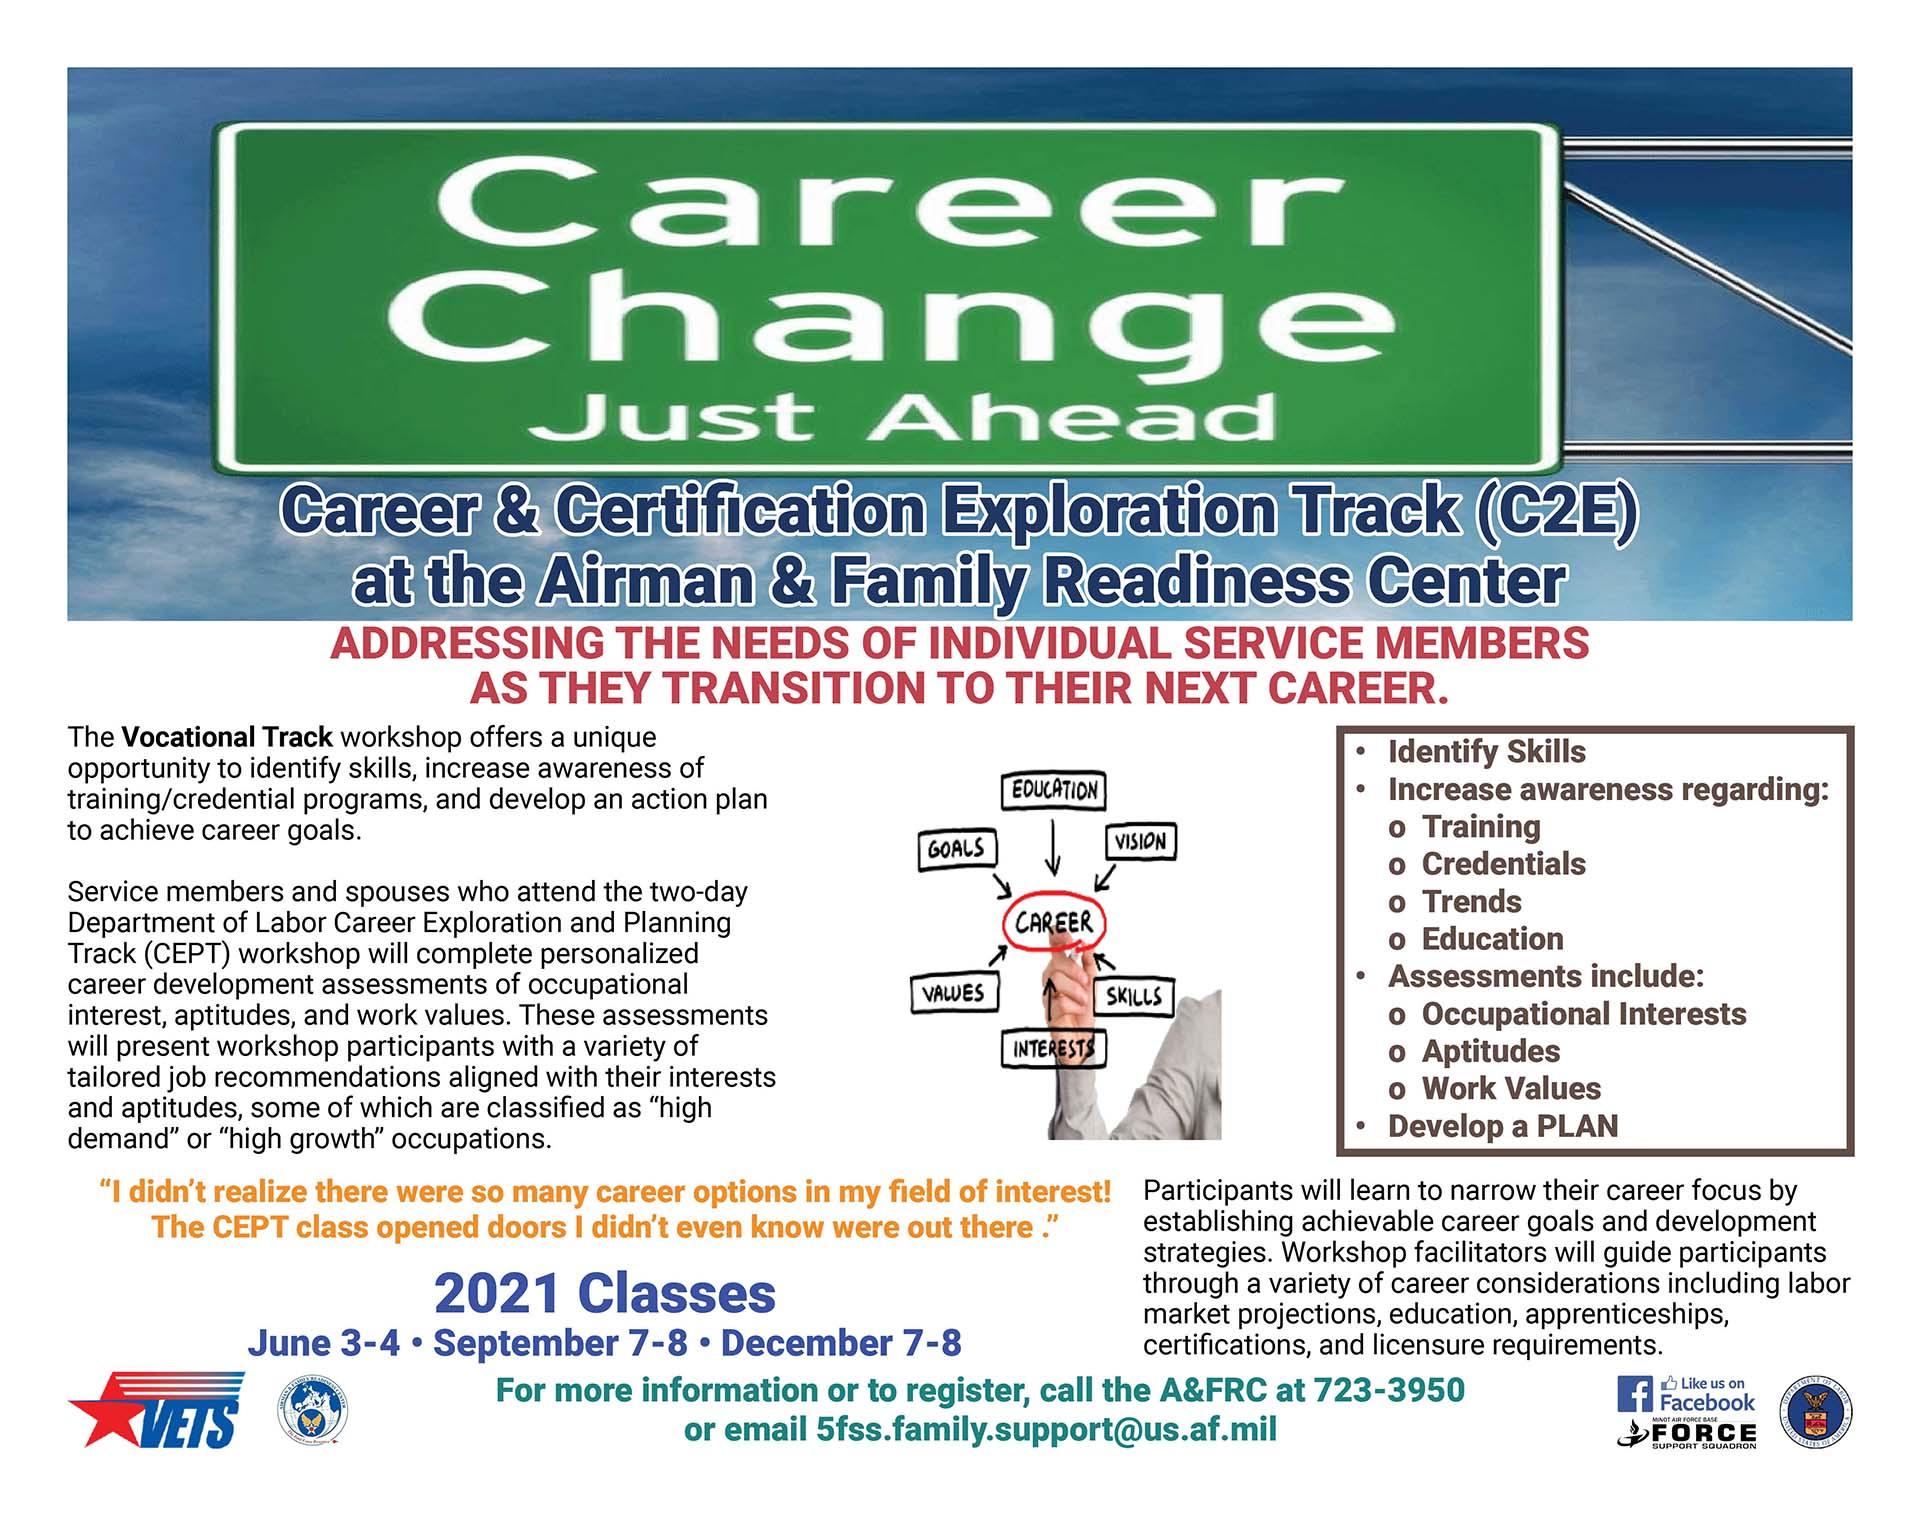 Career & Certification Exploration Track